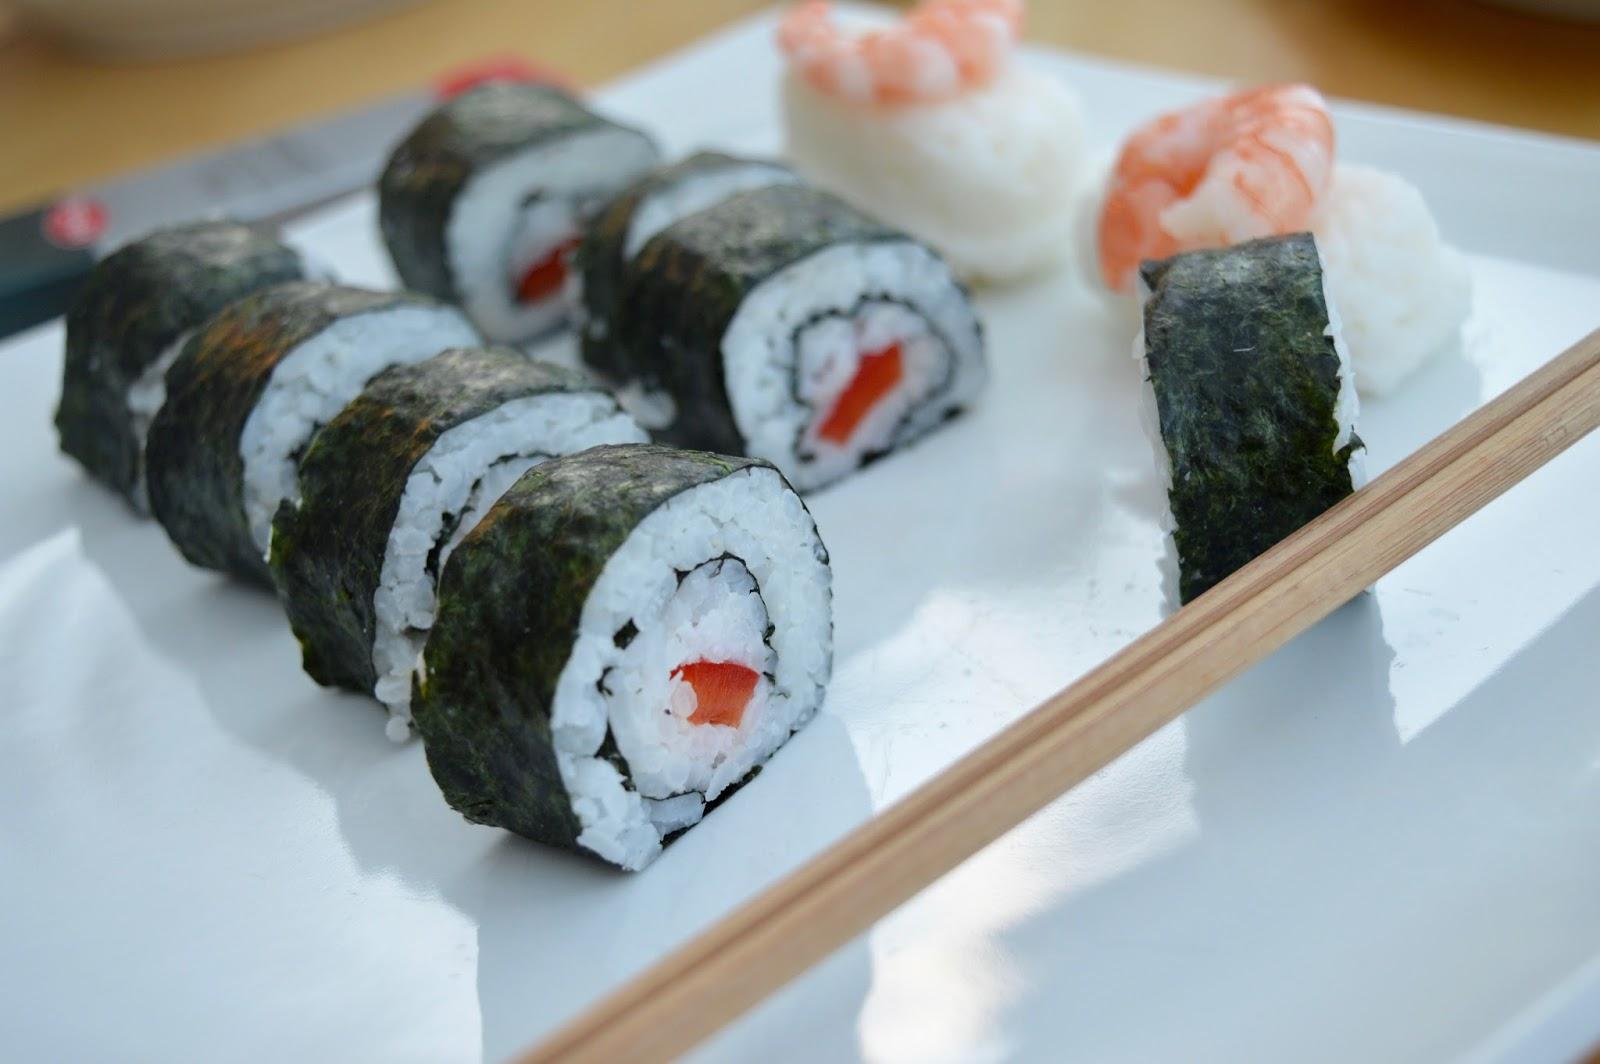 Sushi Making With Kids - A Tutorial for Beginners with Yutaka - homemade sushi recipe